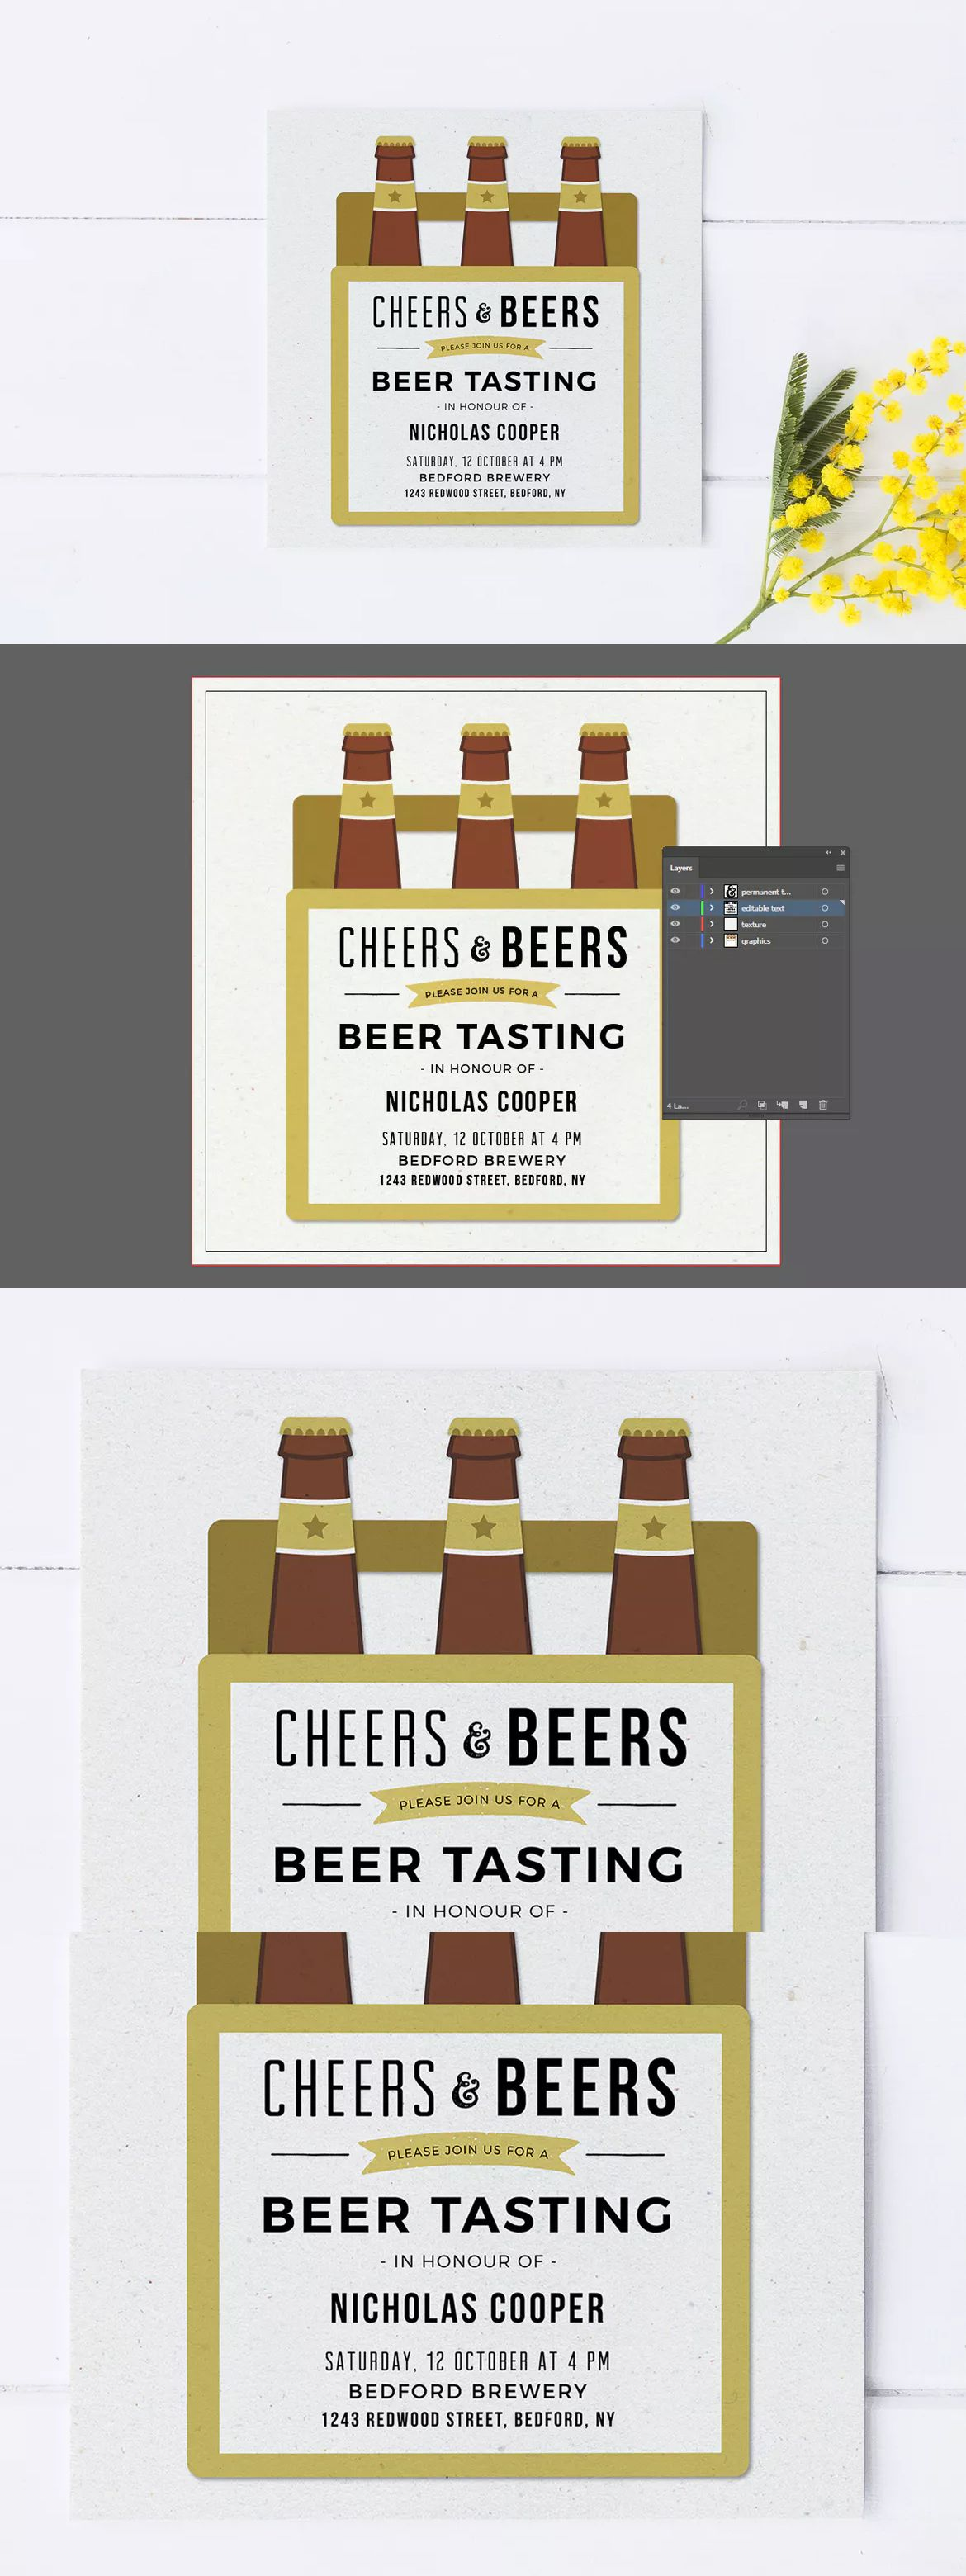 Beer tasting party invitation template ai invitation card beer tasting party invitation template ai stopboris Gallery